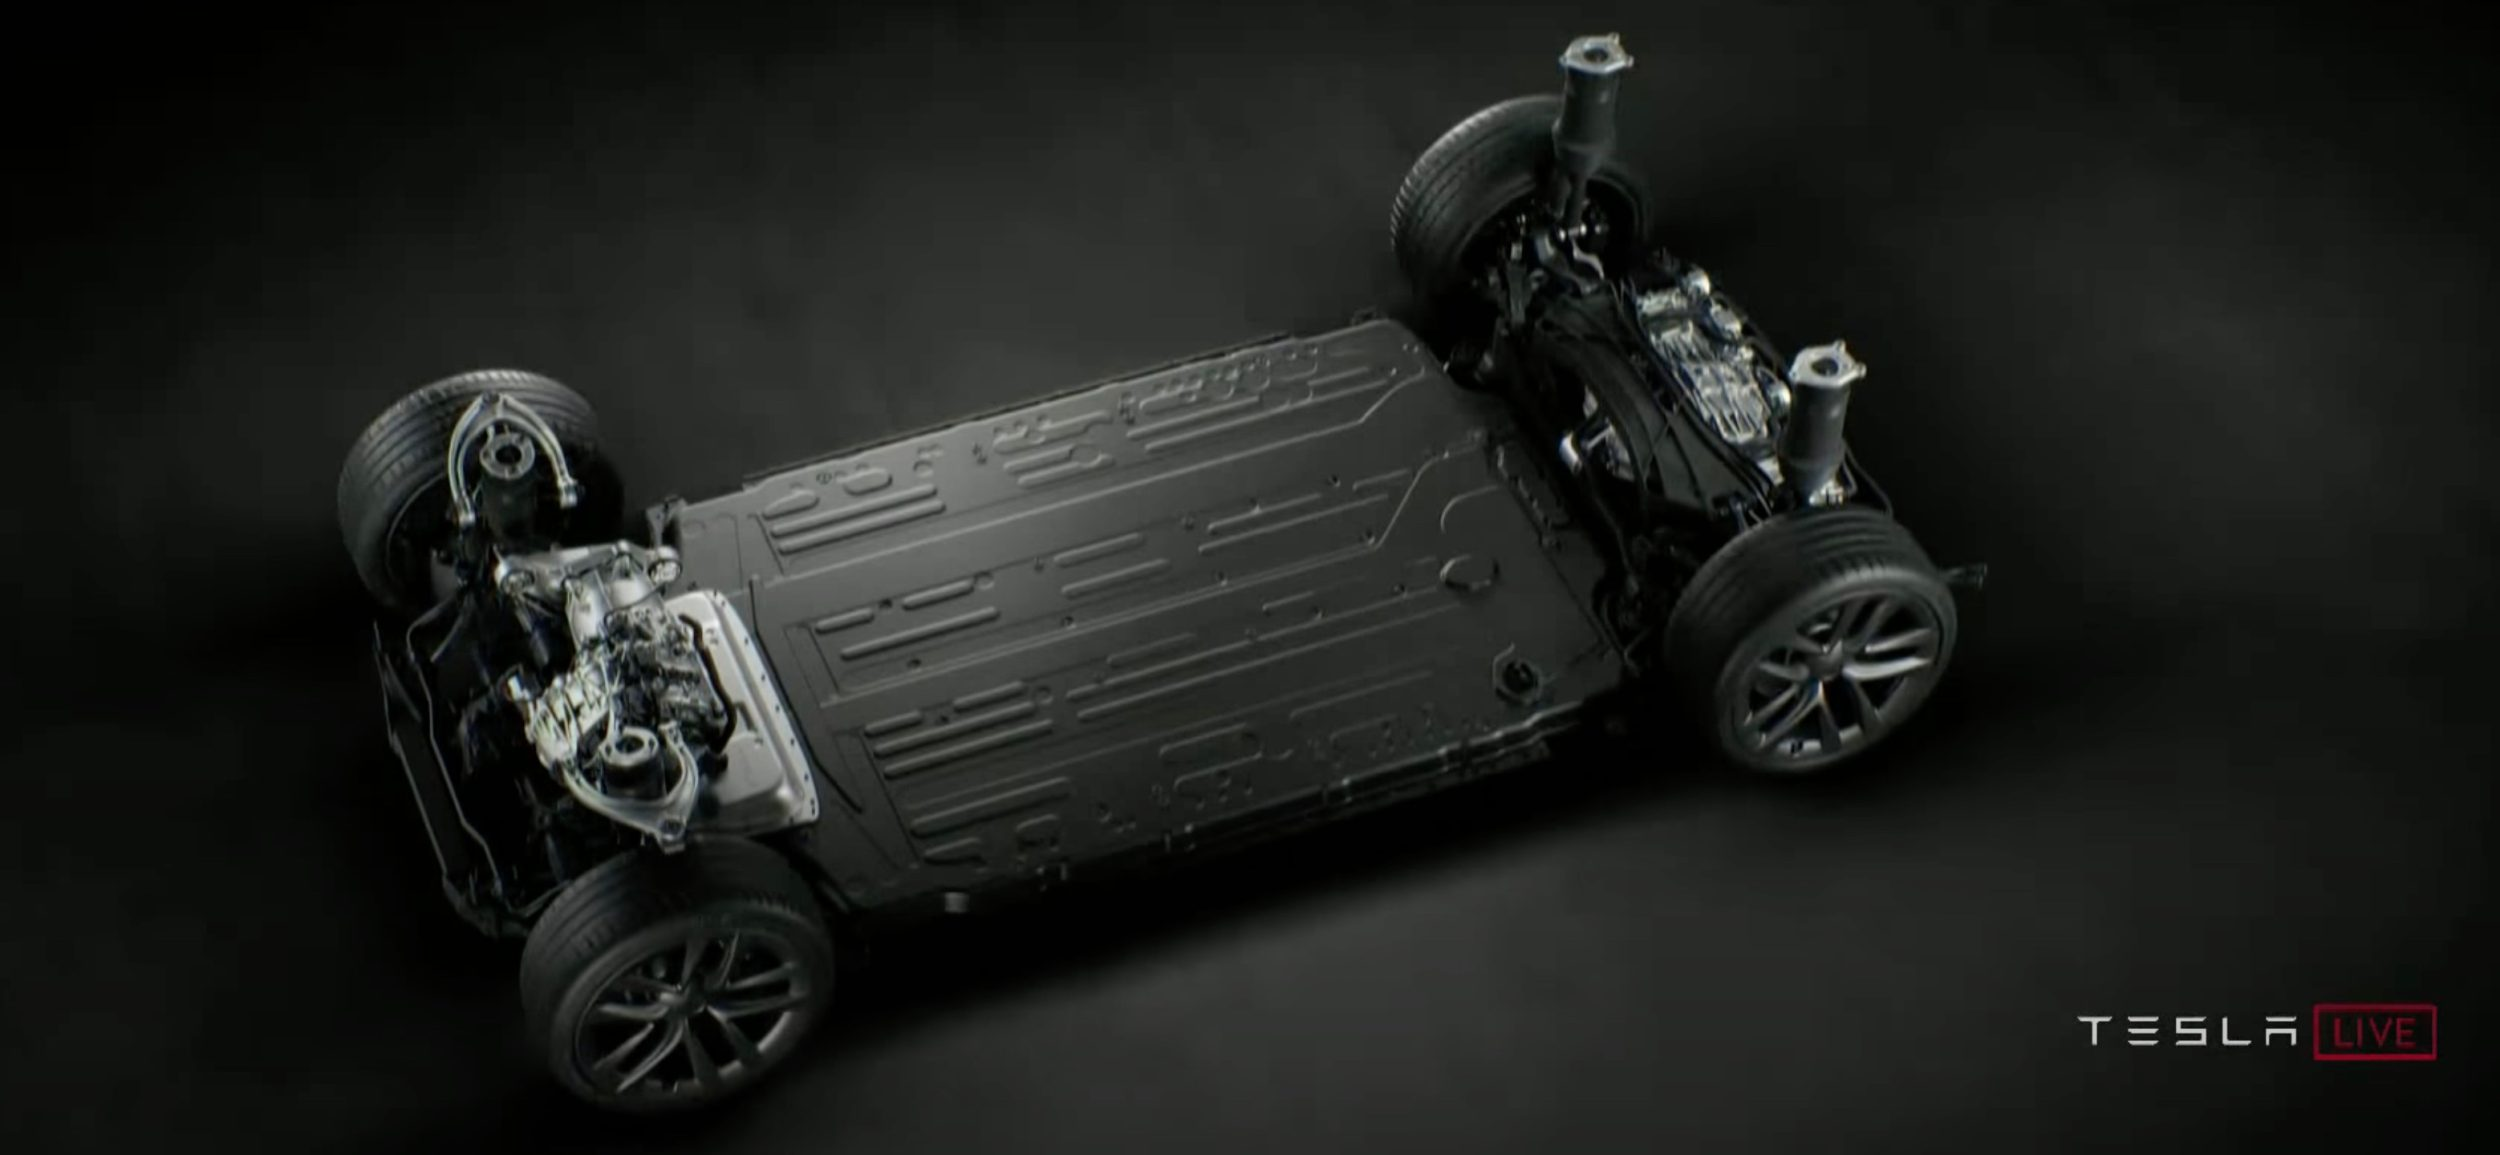 Batéria a pohonná sústava Tesla Model S Plaid I Foto: MotorTrend